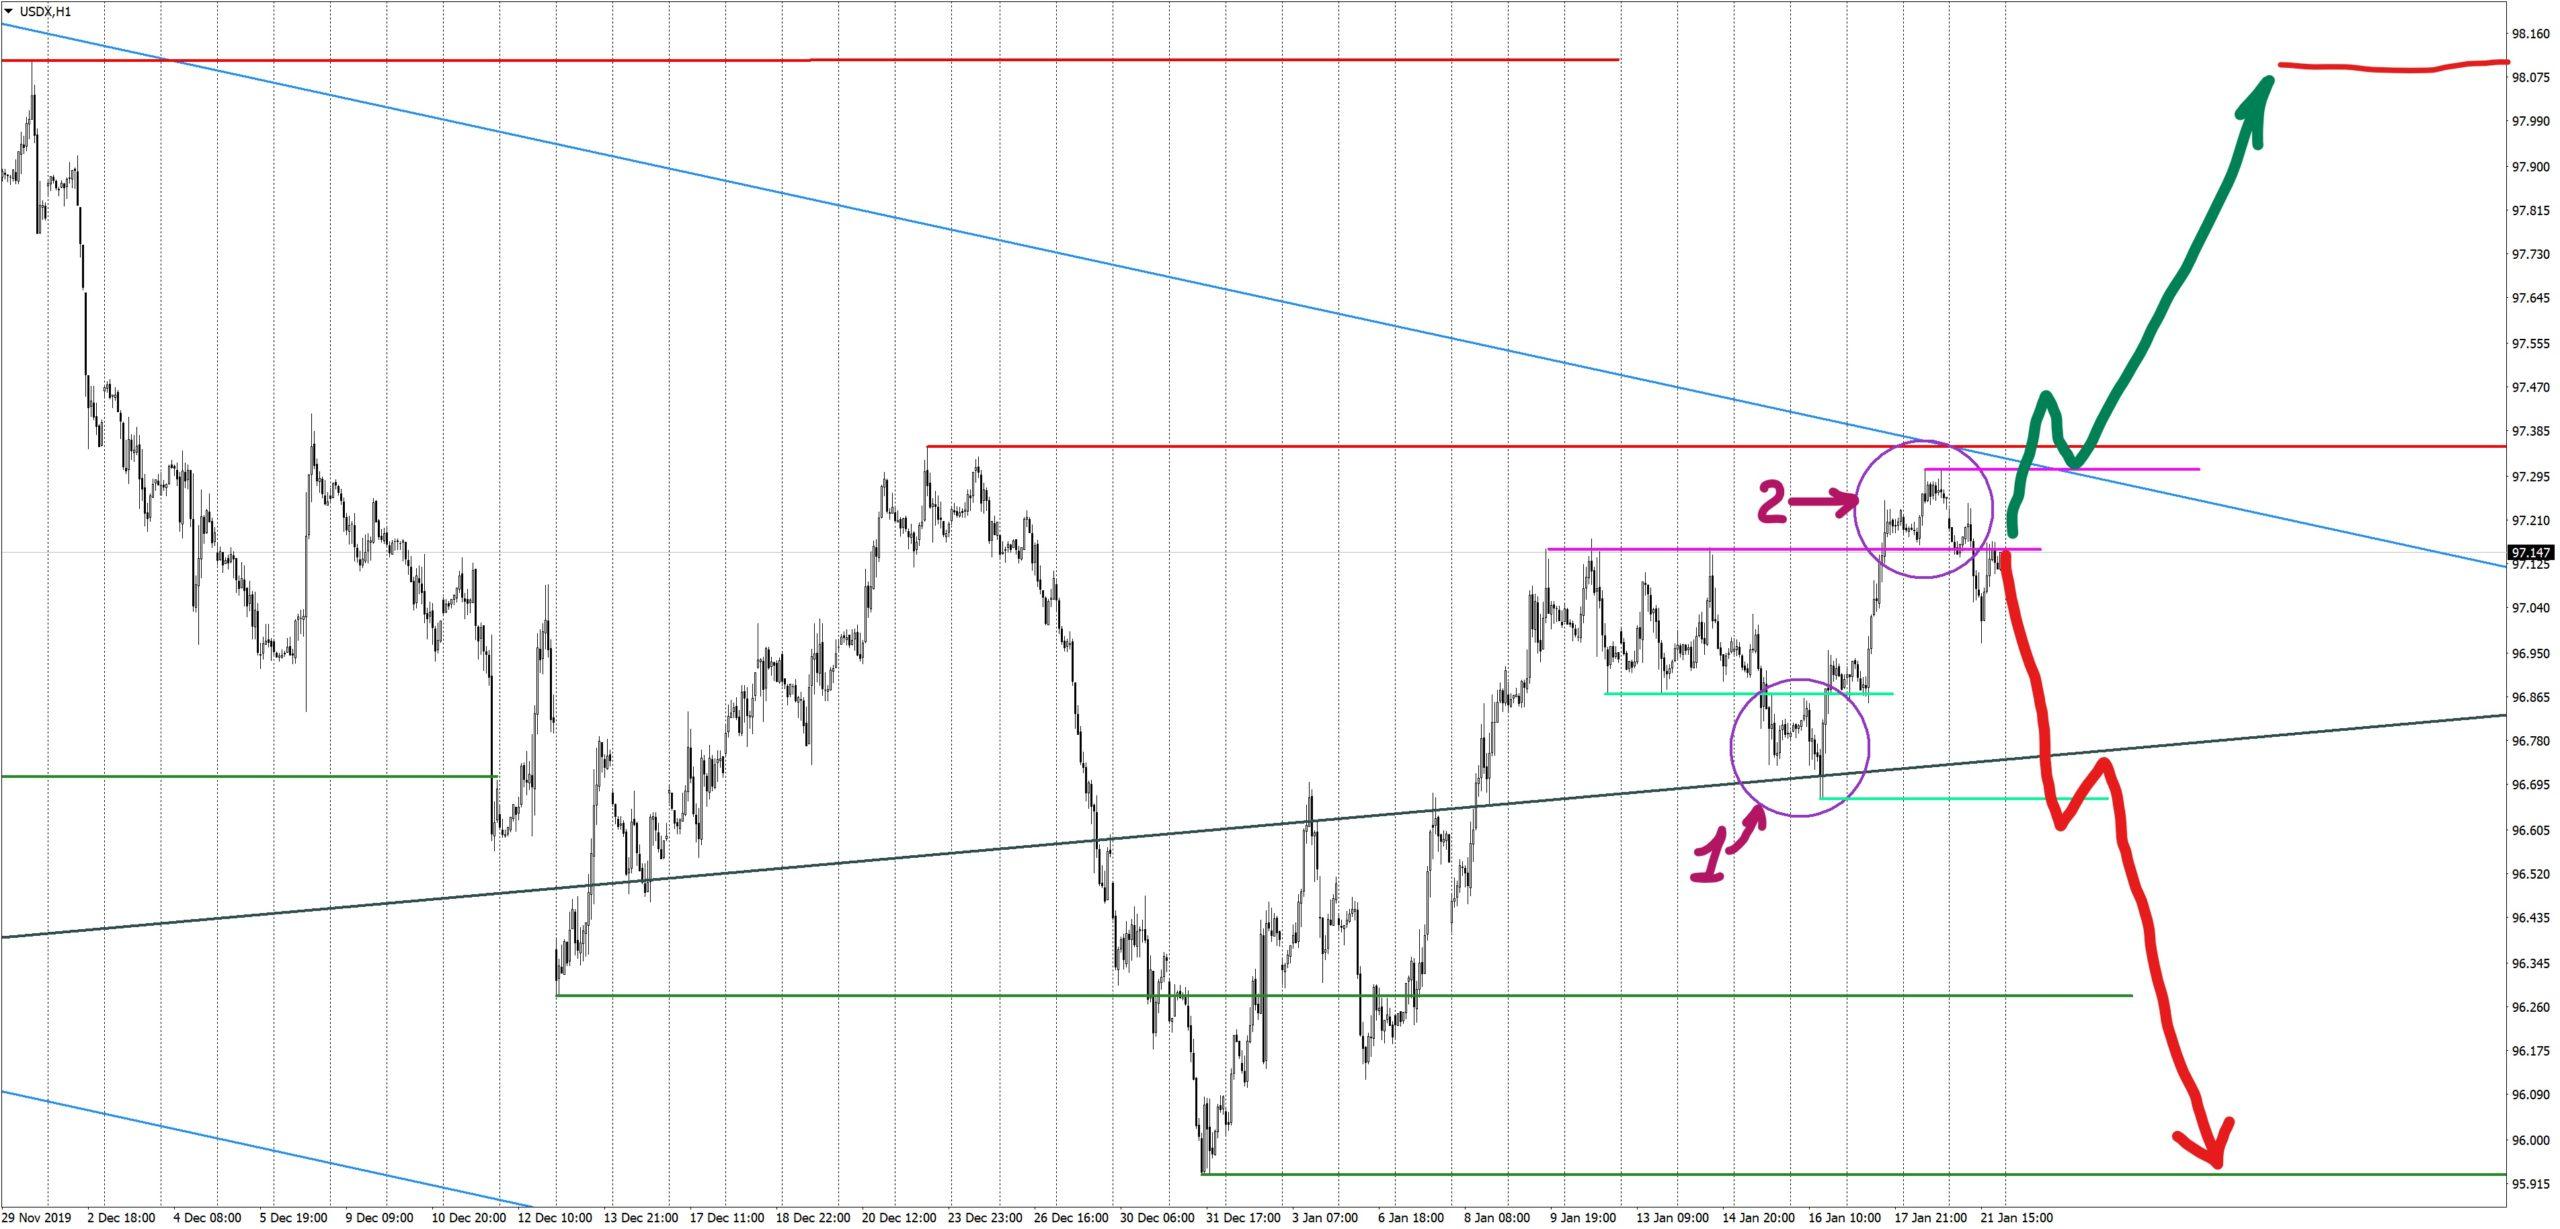 USDX H1 analysis